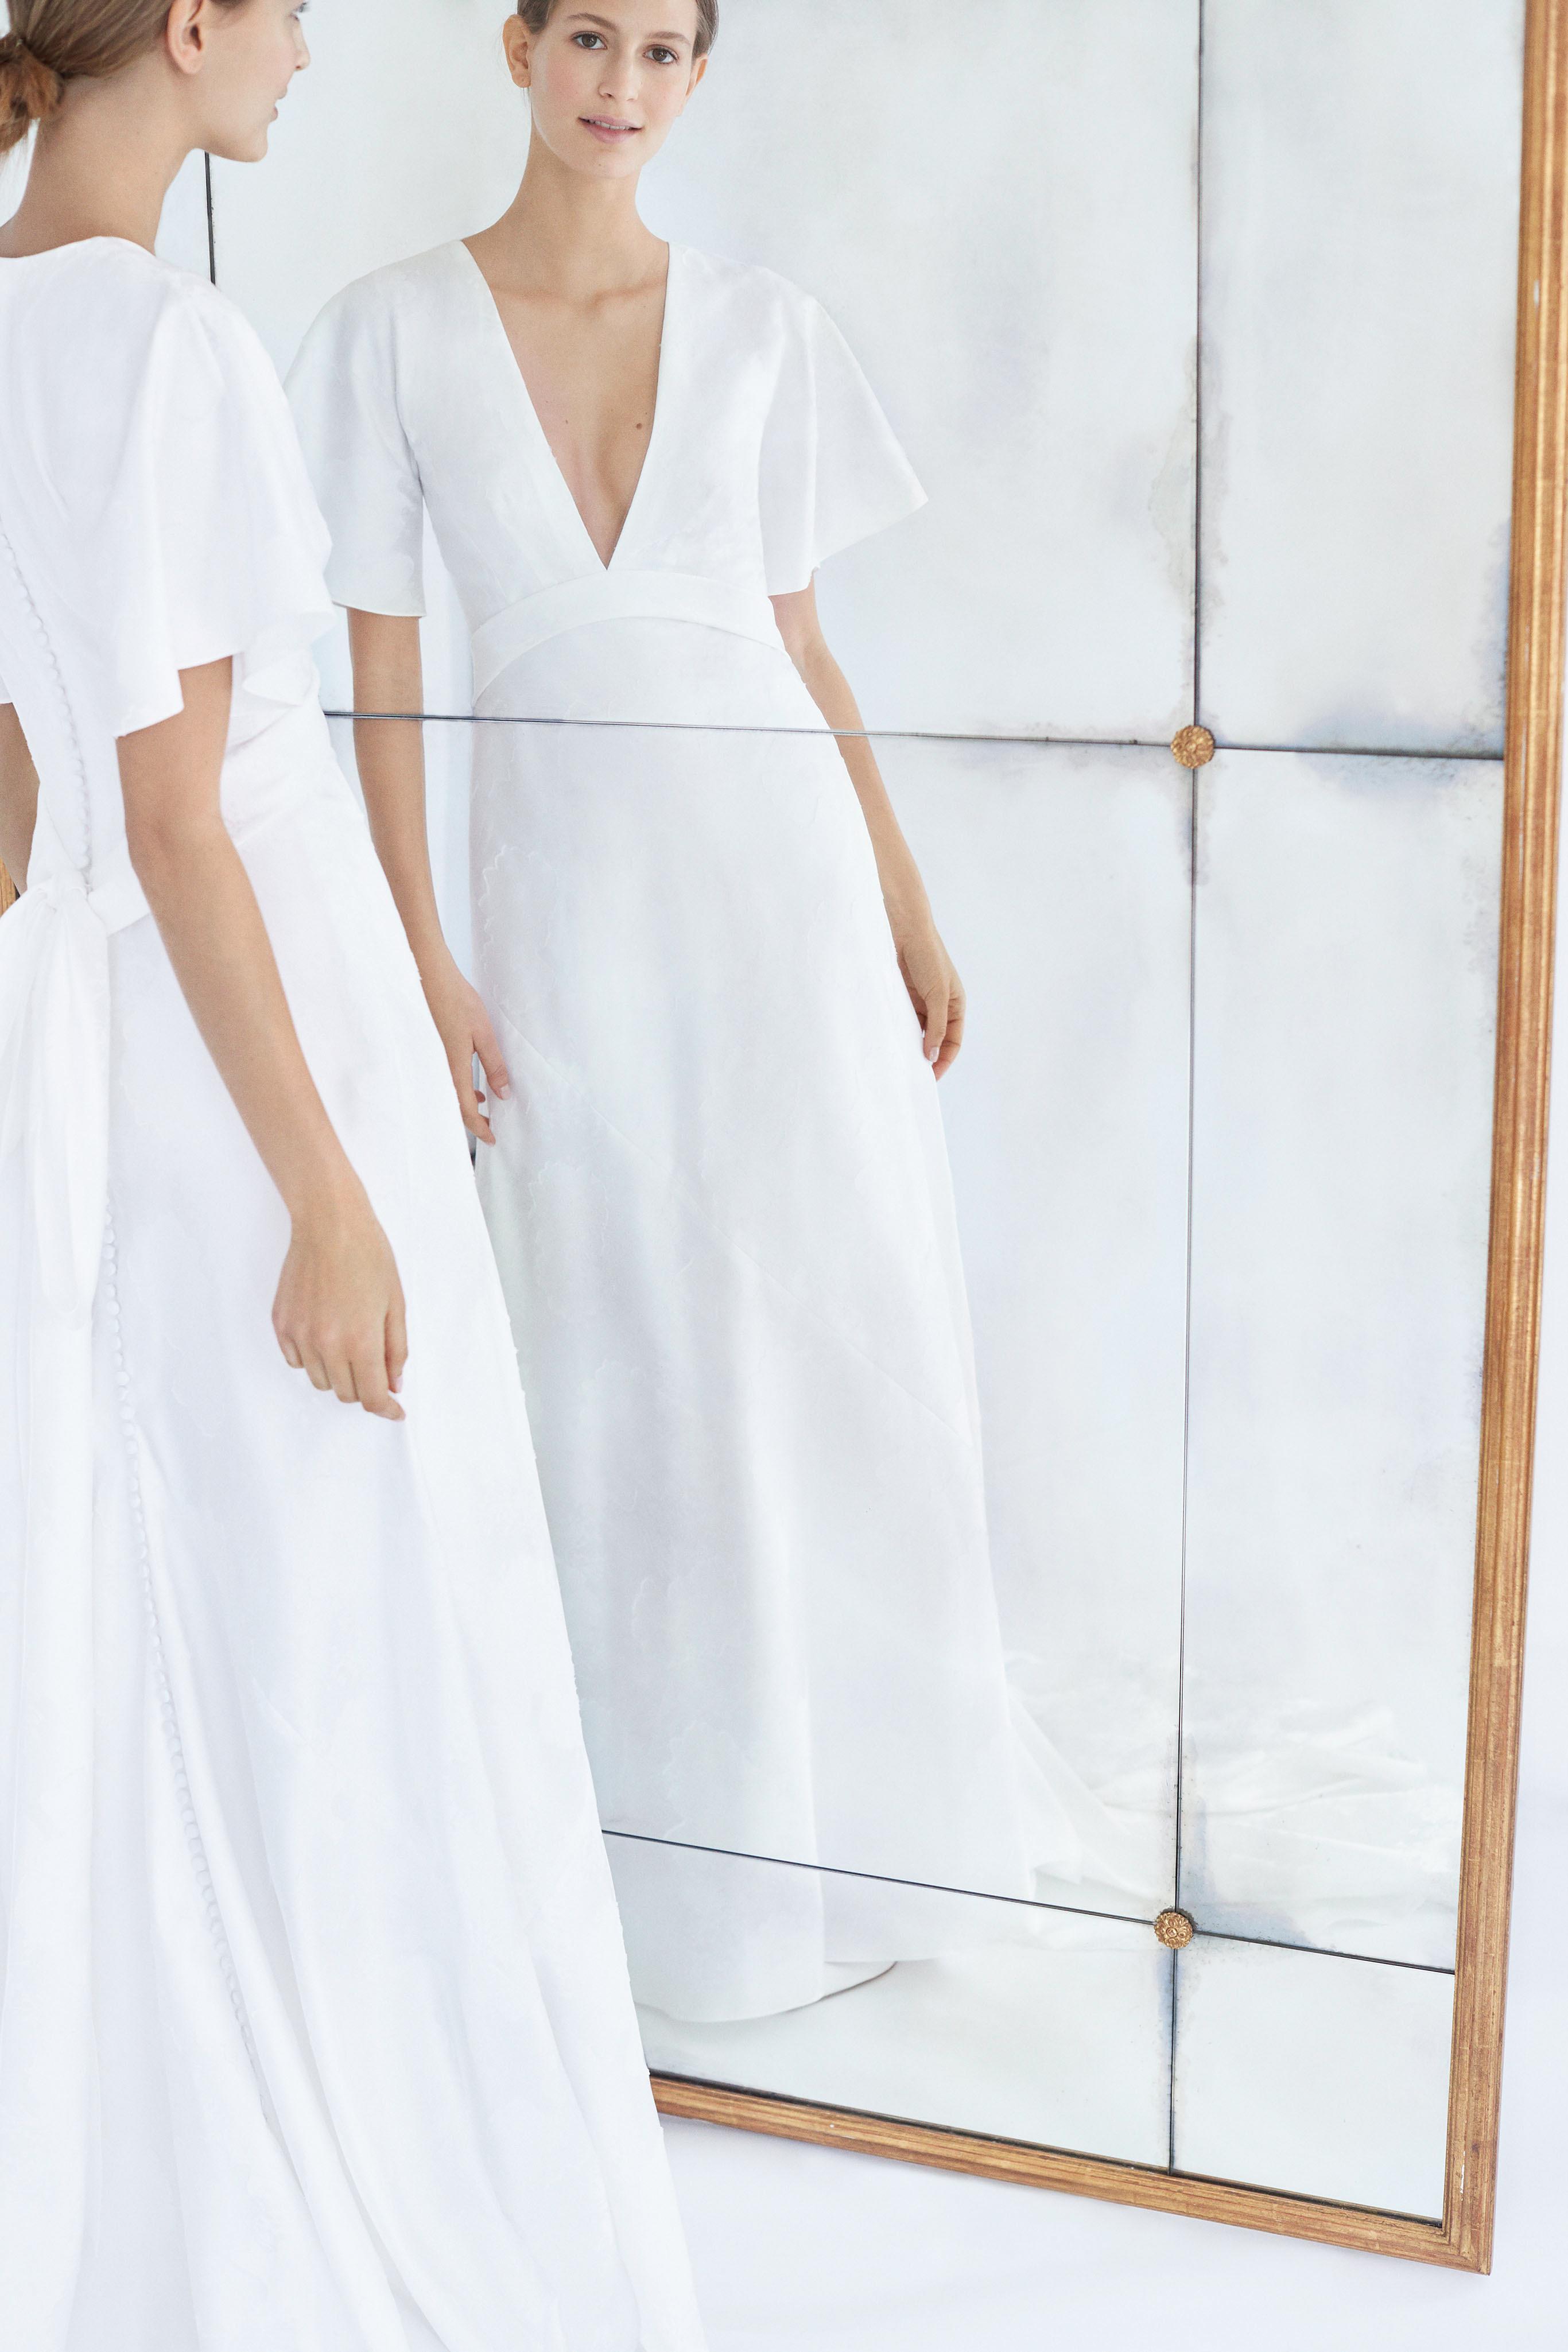 carolina herrera wedding dress fall 2018 v-neck short sleeve